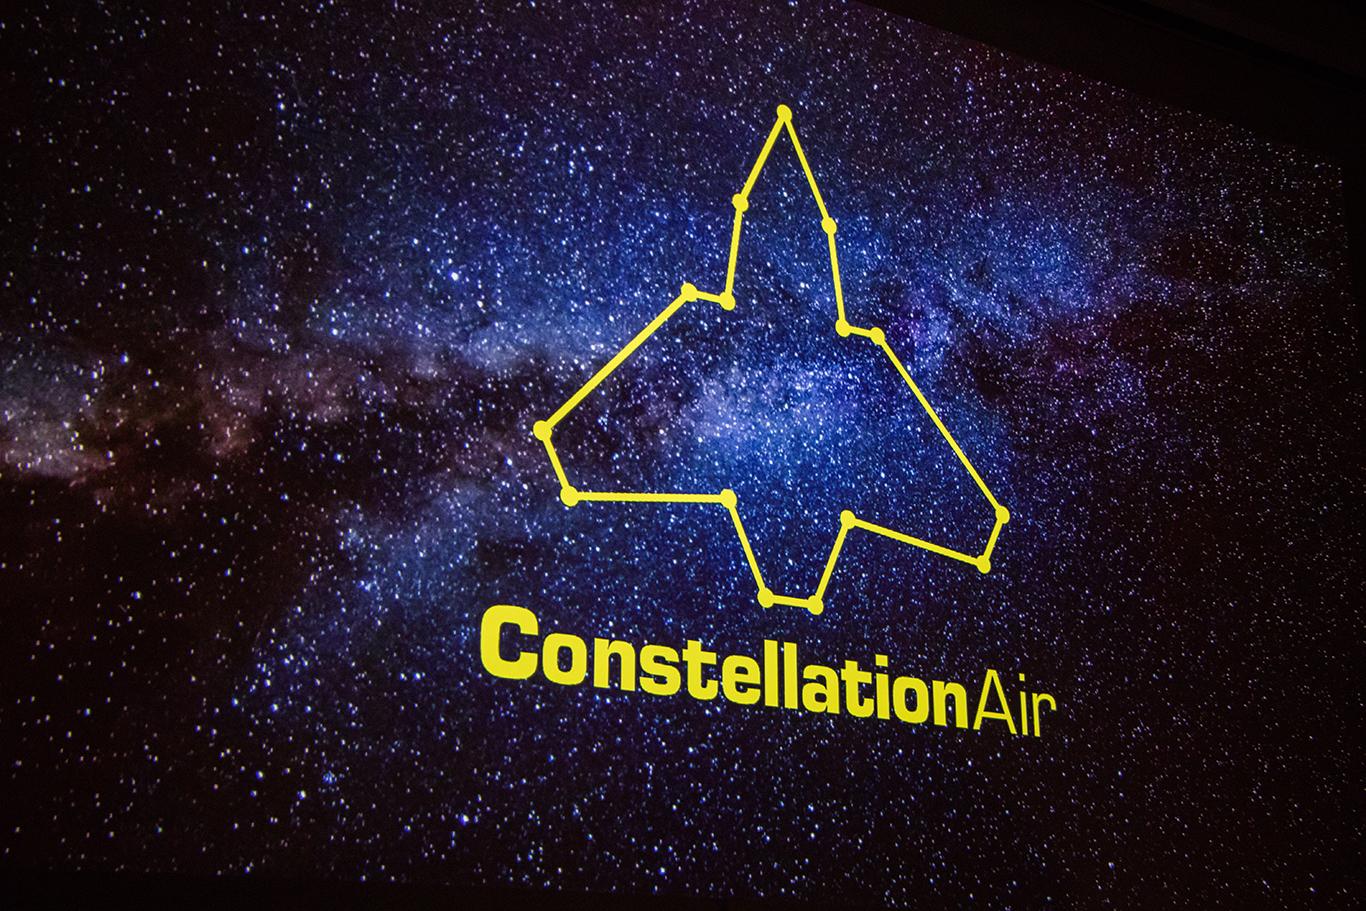 constellationair1.jpg